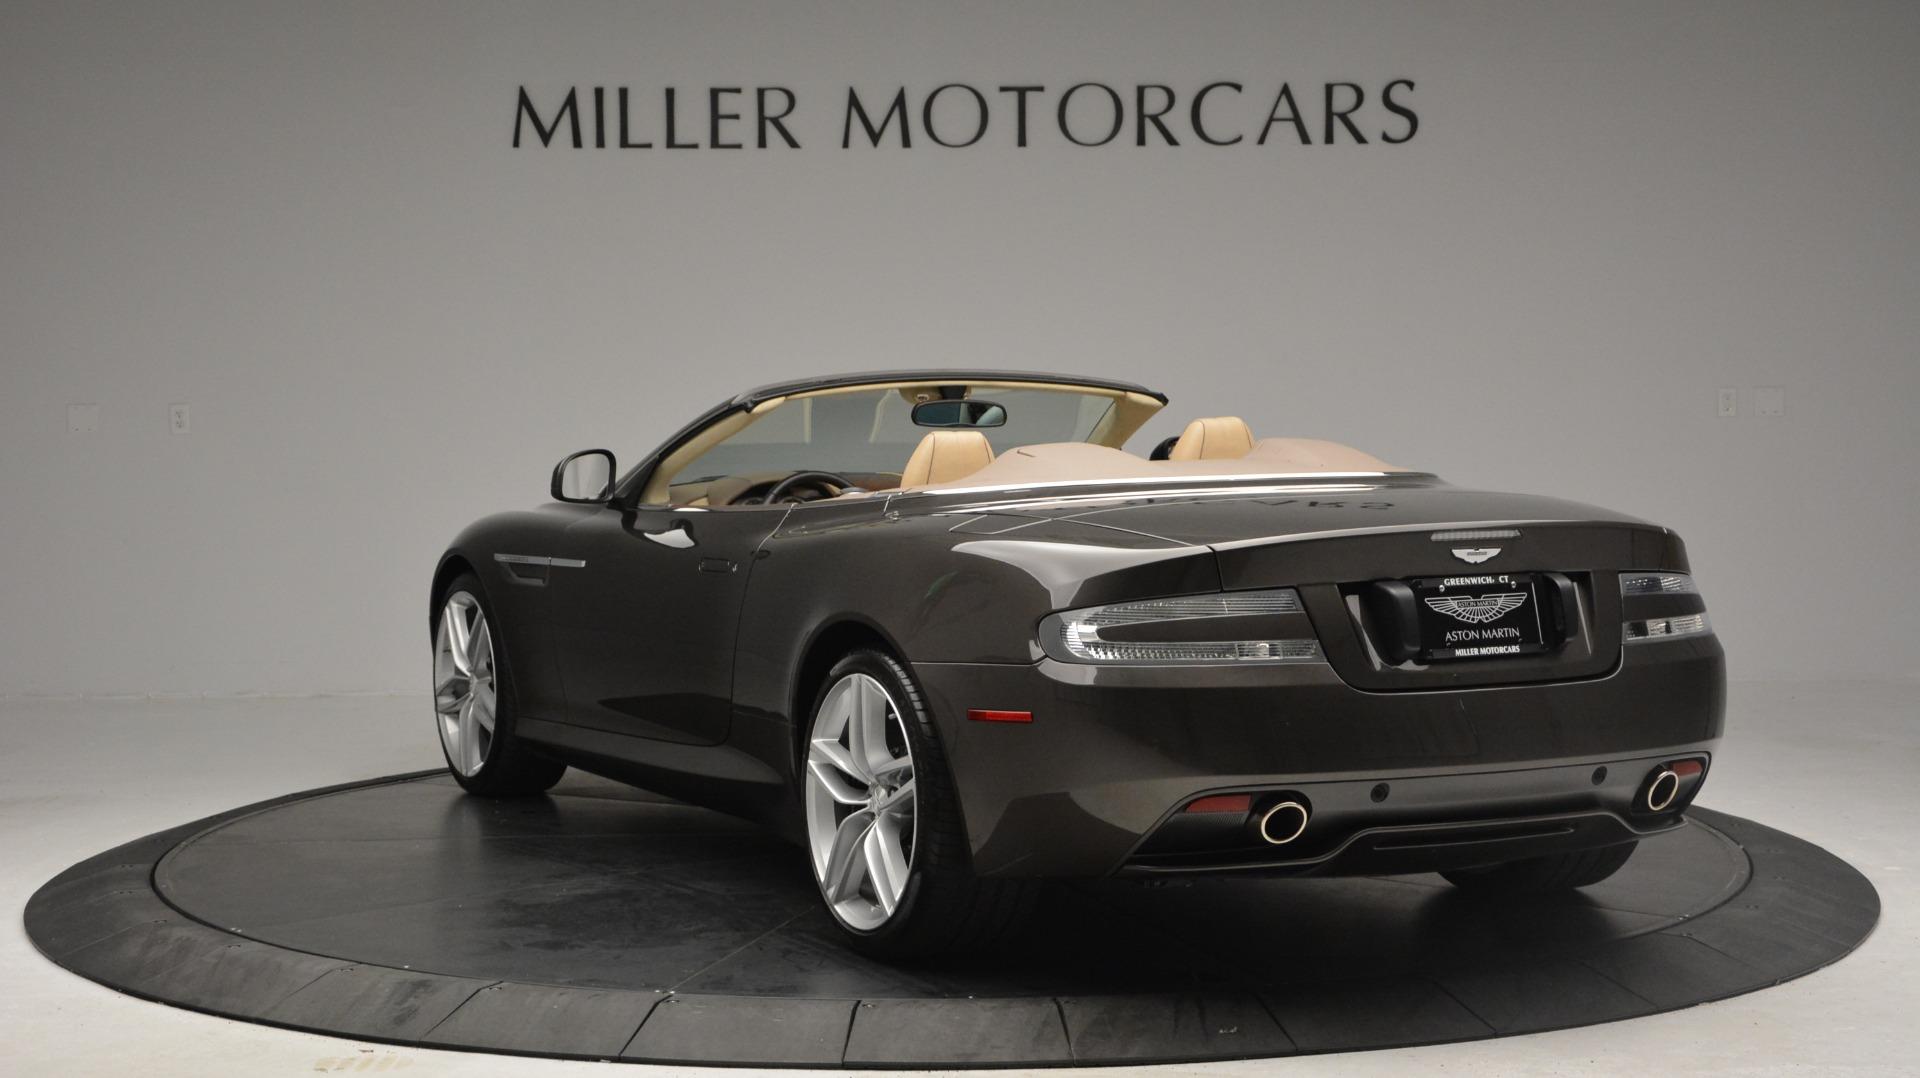 Used 2012 Aston Martin Virage Convertible For Sale In Greenwich, CT. Alfa Romeo of Greenwich, 7613 3351_p5